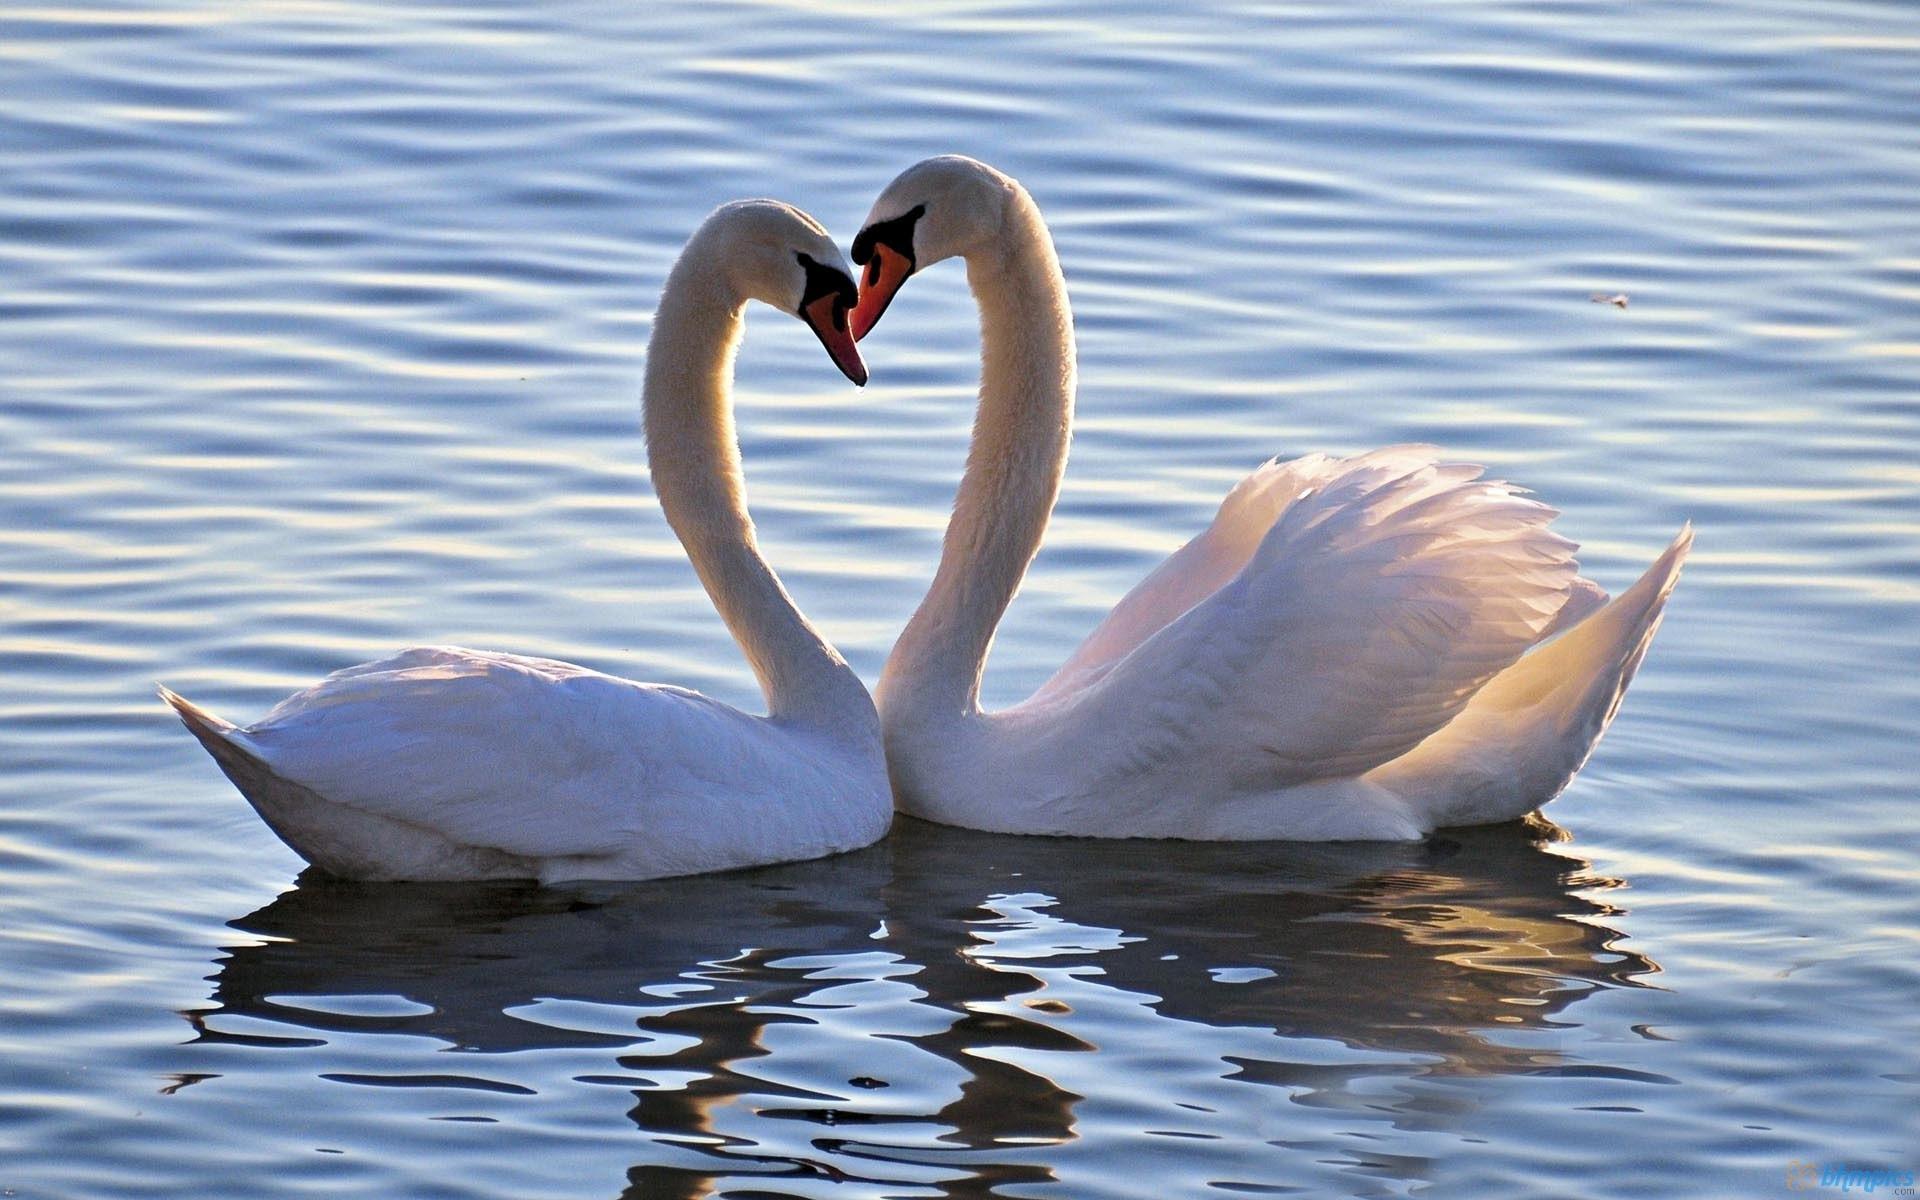 lovebirds wallpaper 56 images